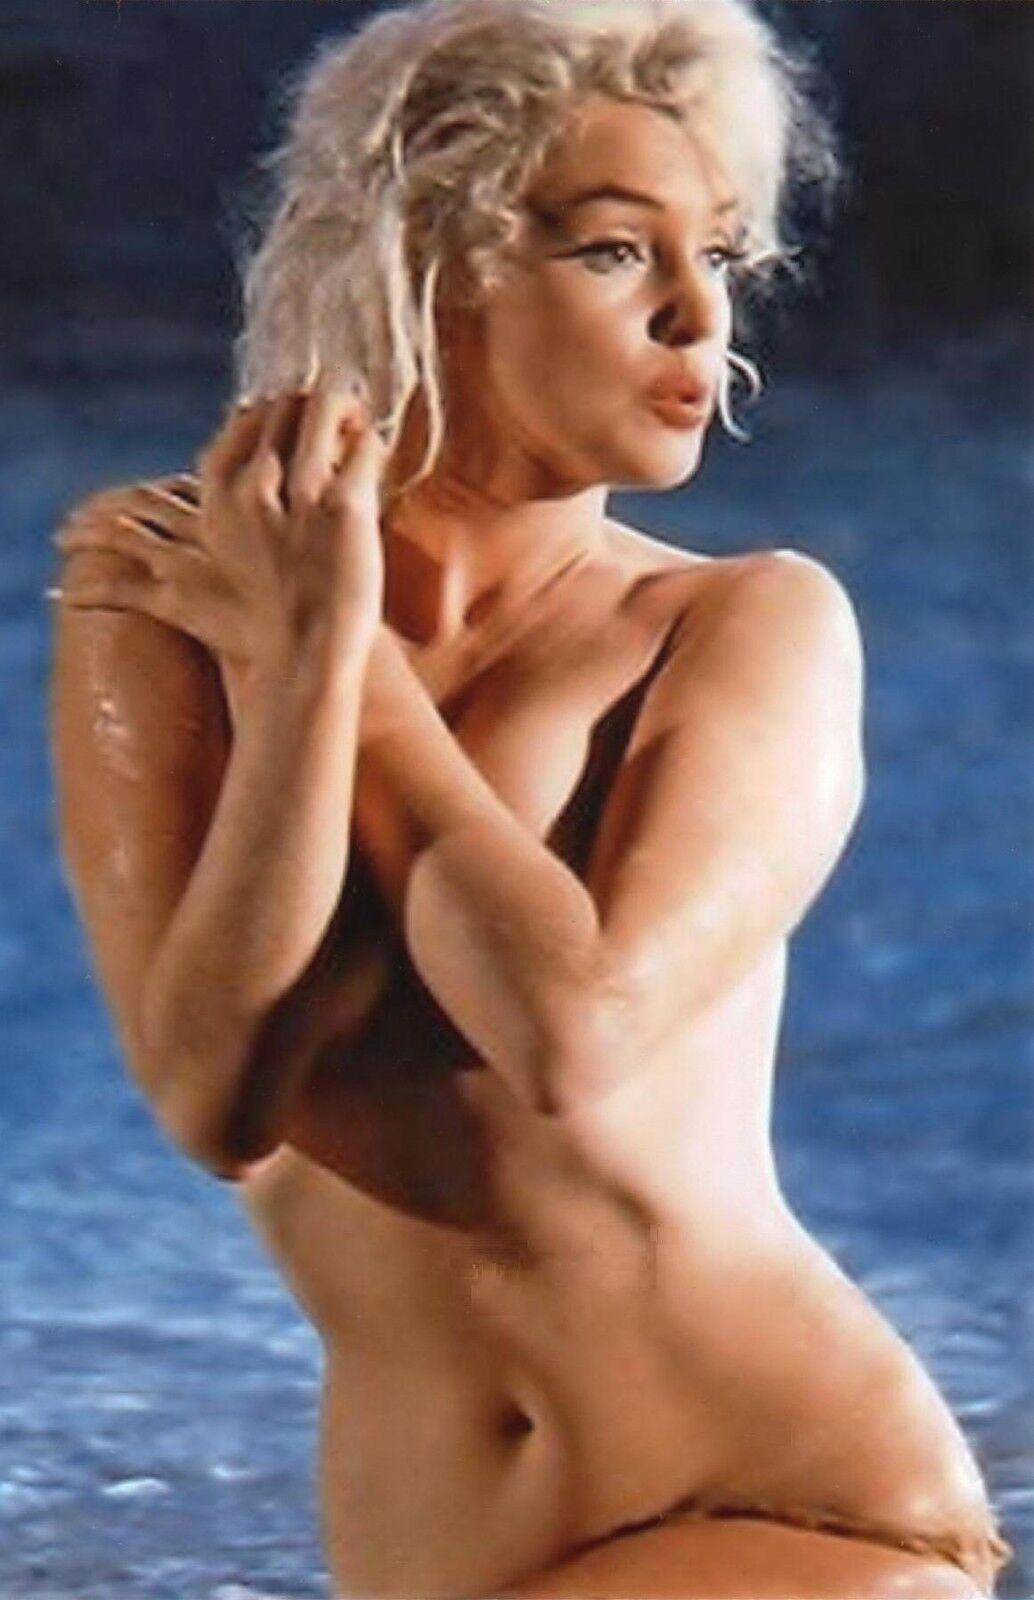 Marilyn monroes last nude photo shoot